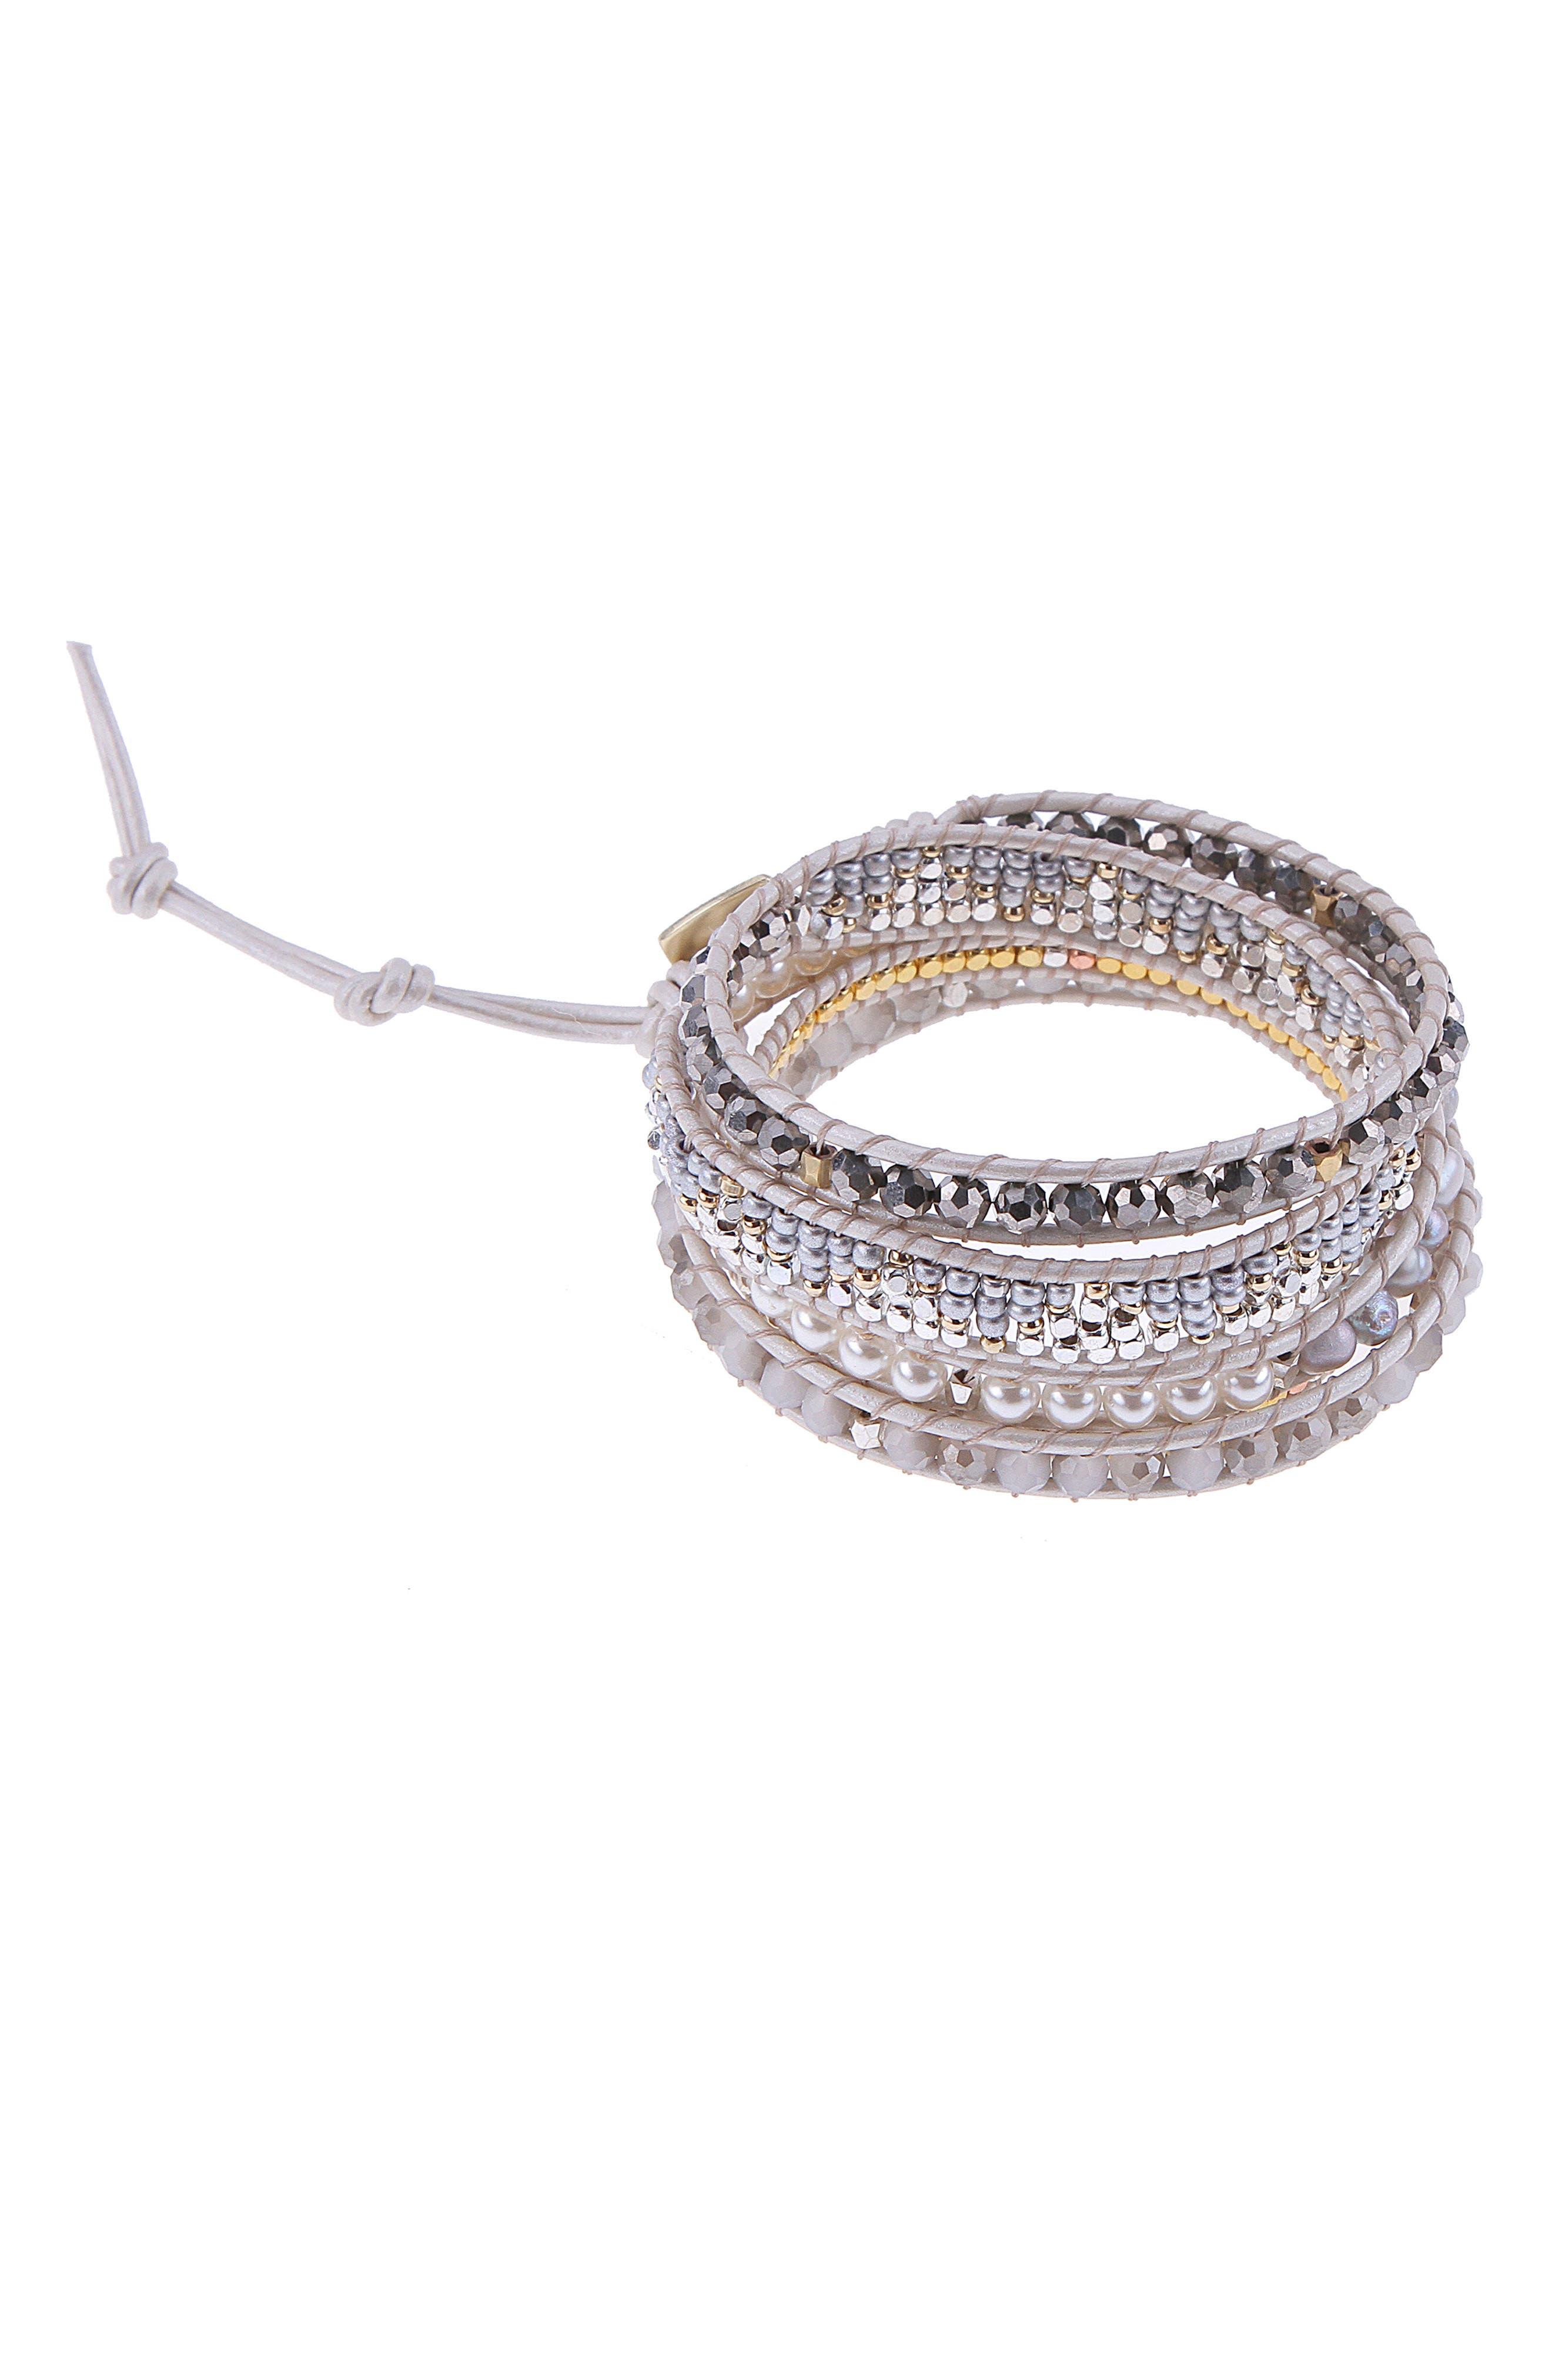 Crystal & Imitation Pearl Beaded Wrap Bracelet,                         Main,                         color, 100